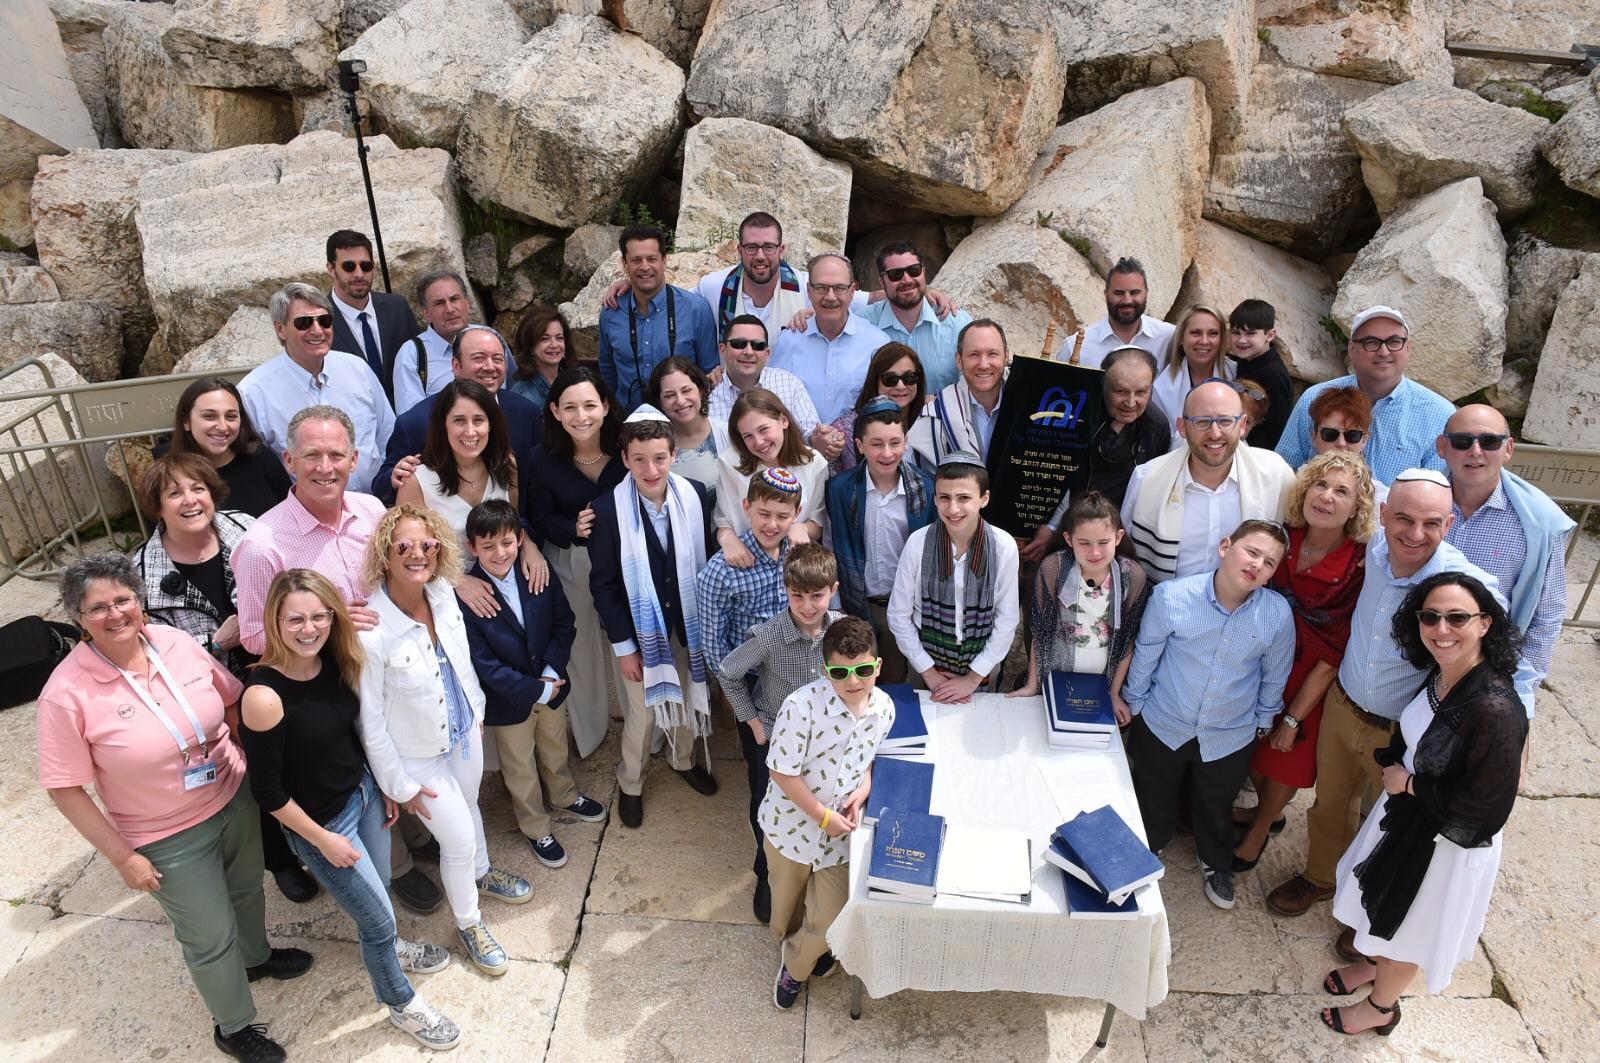 israel 2019 bnei mitzvah